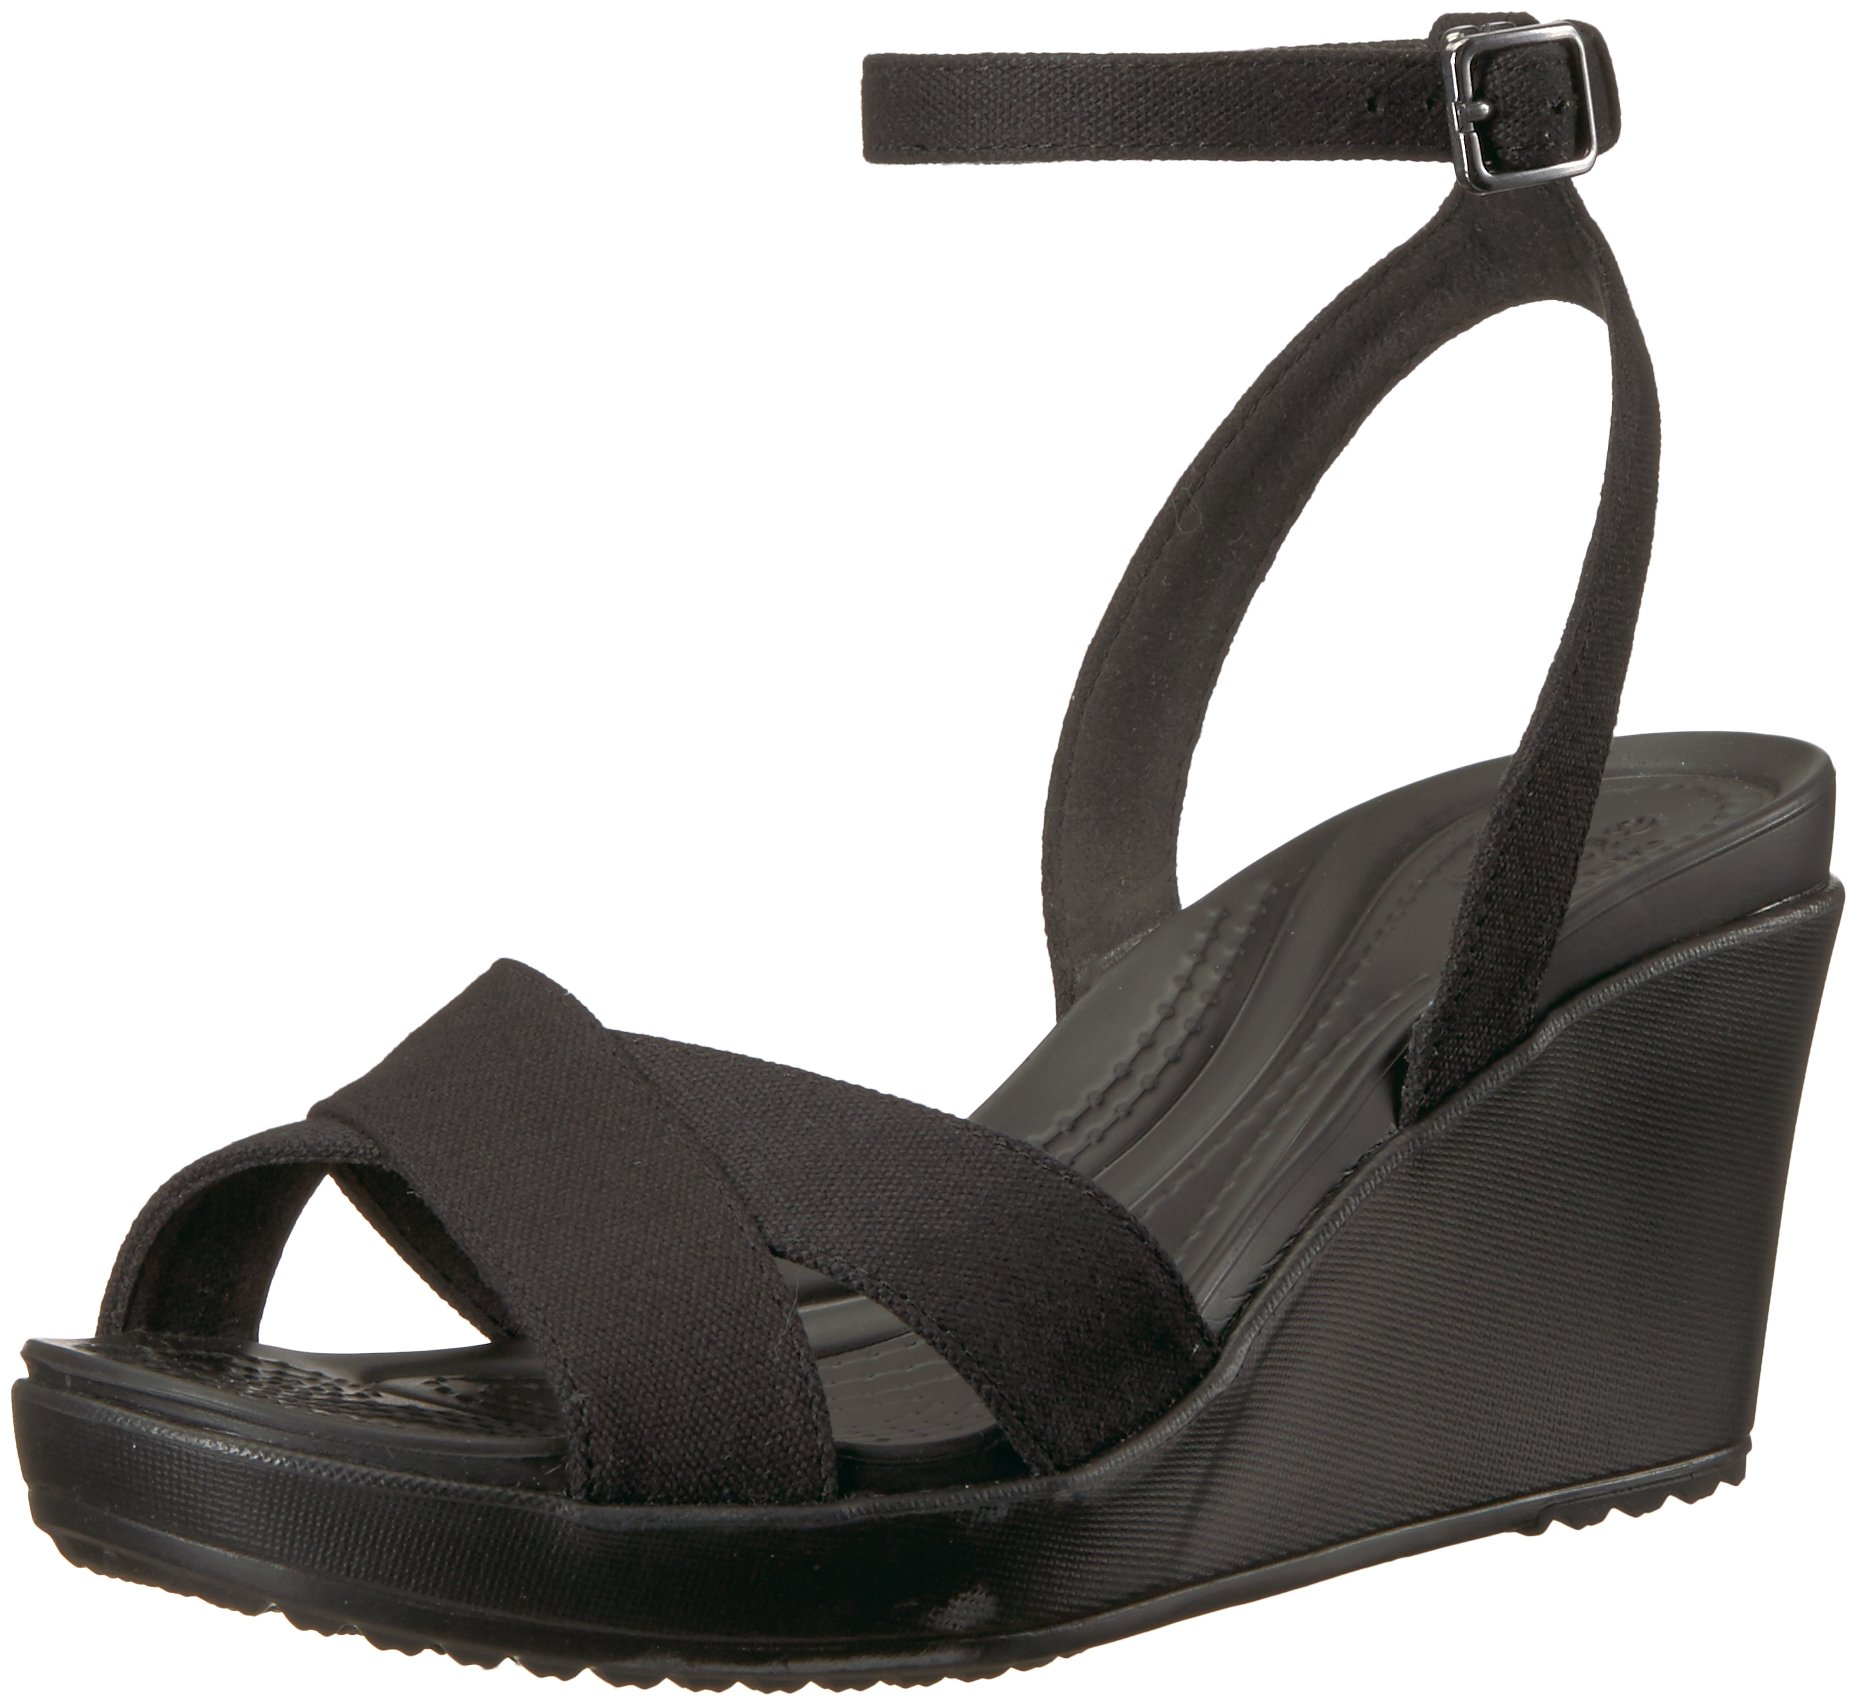 aaab4cb7bcdca Galleon - Crocs Women s Leigh II Ankle Strap Wedge W Sandal